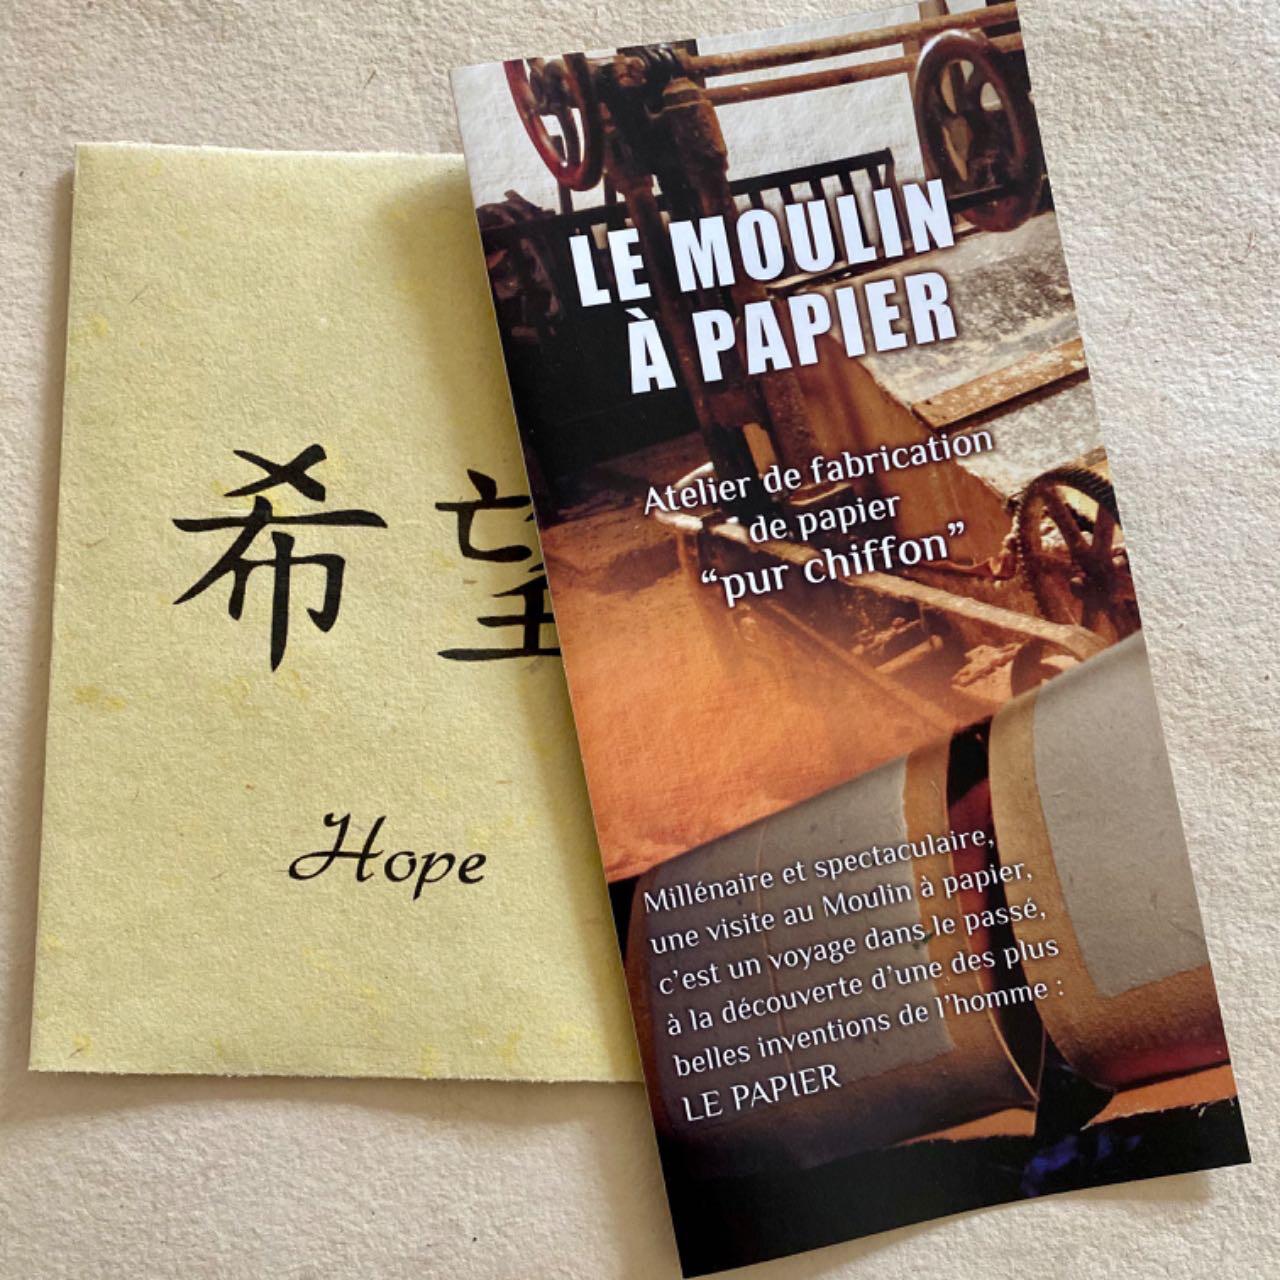 Hope (l'Espoir)